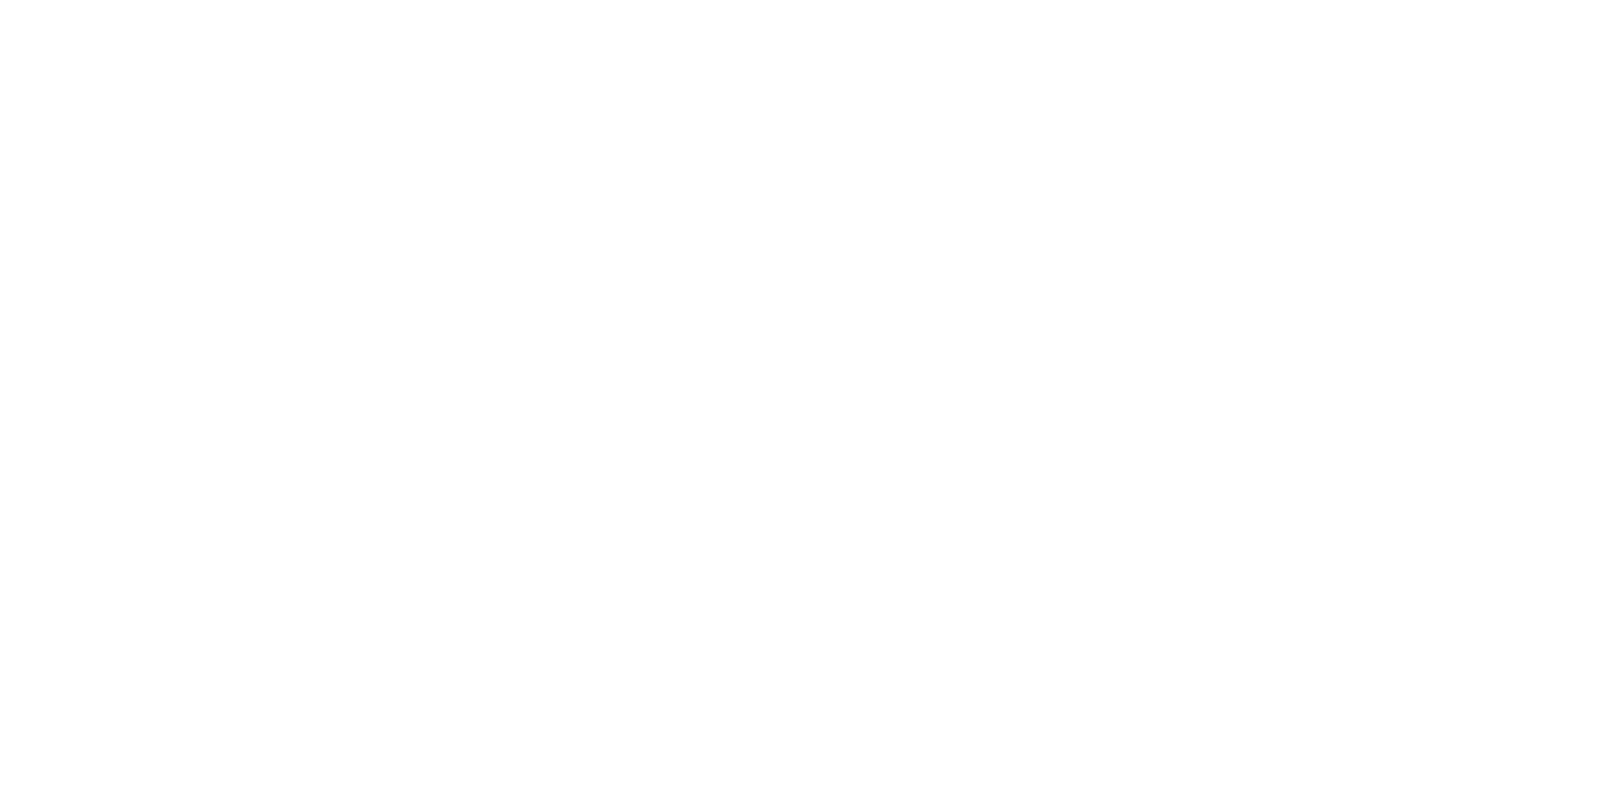 Eric Van Zytveld, D.D.S.